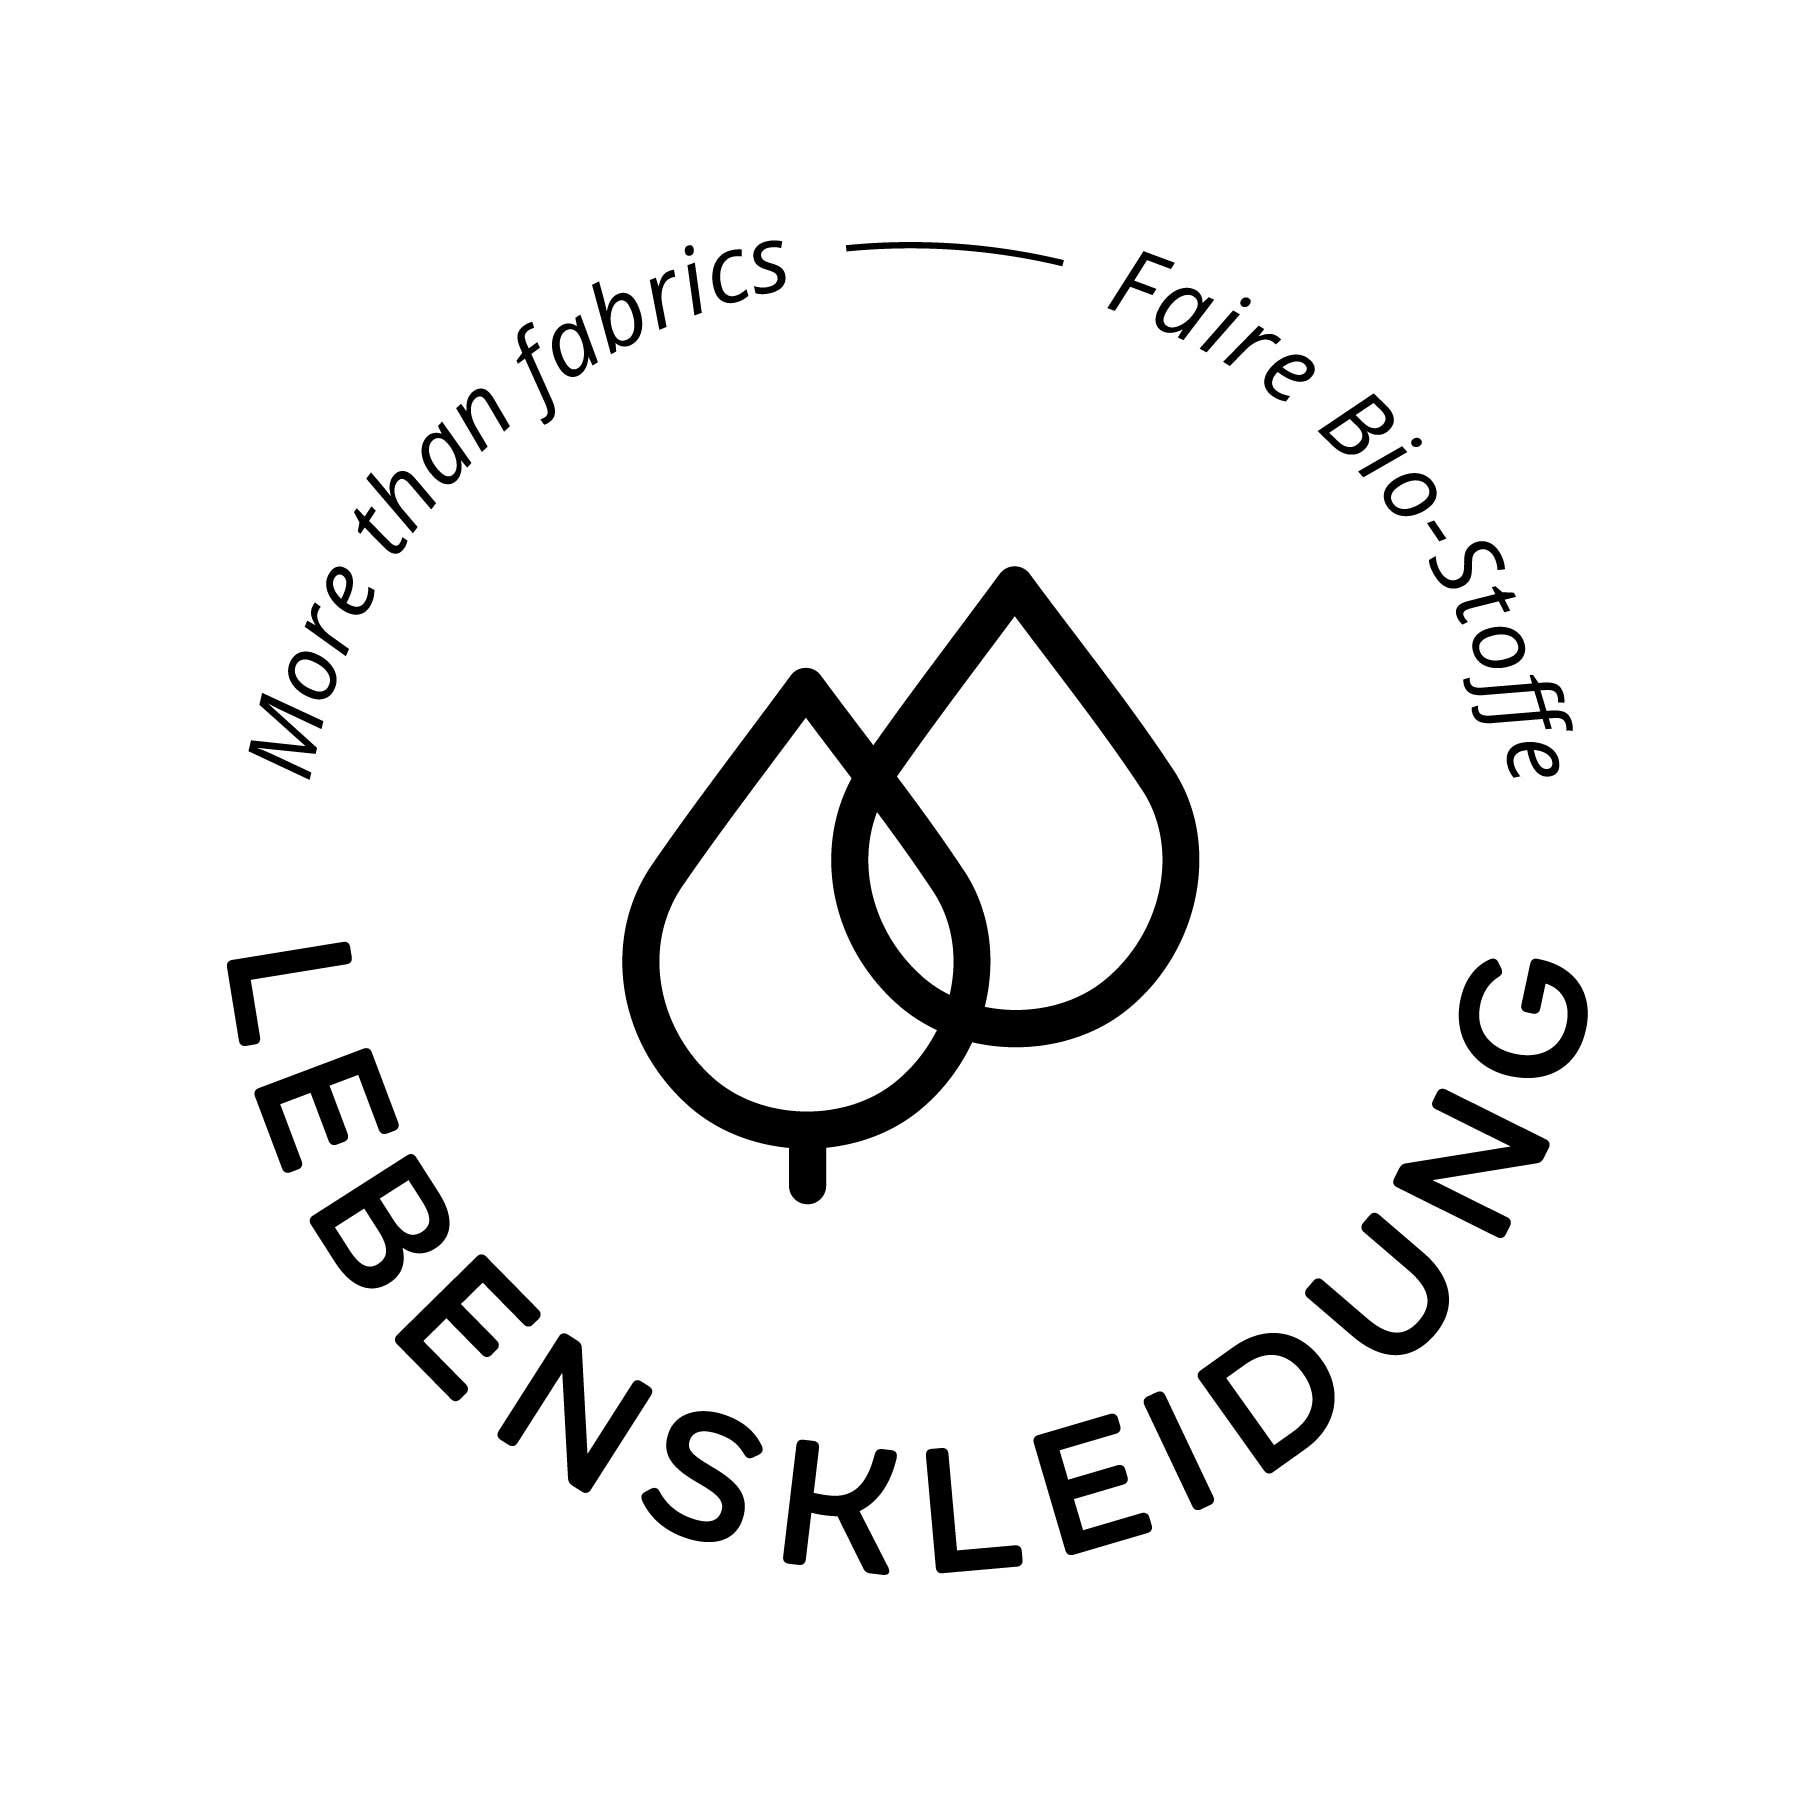 Bio Tissu RIB 2x1 (manchette) - Bois de rose